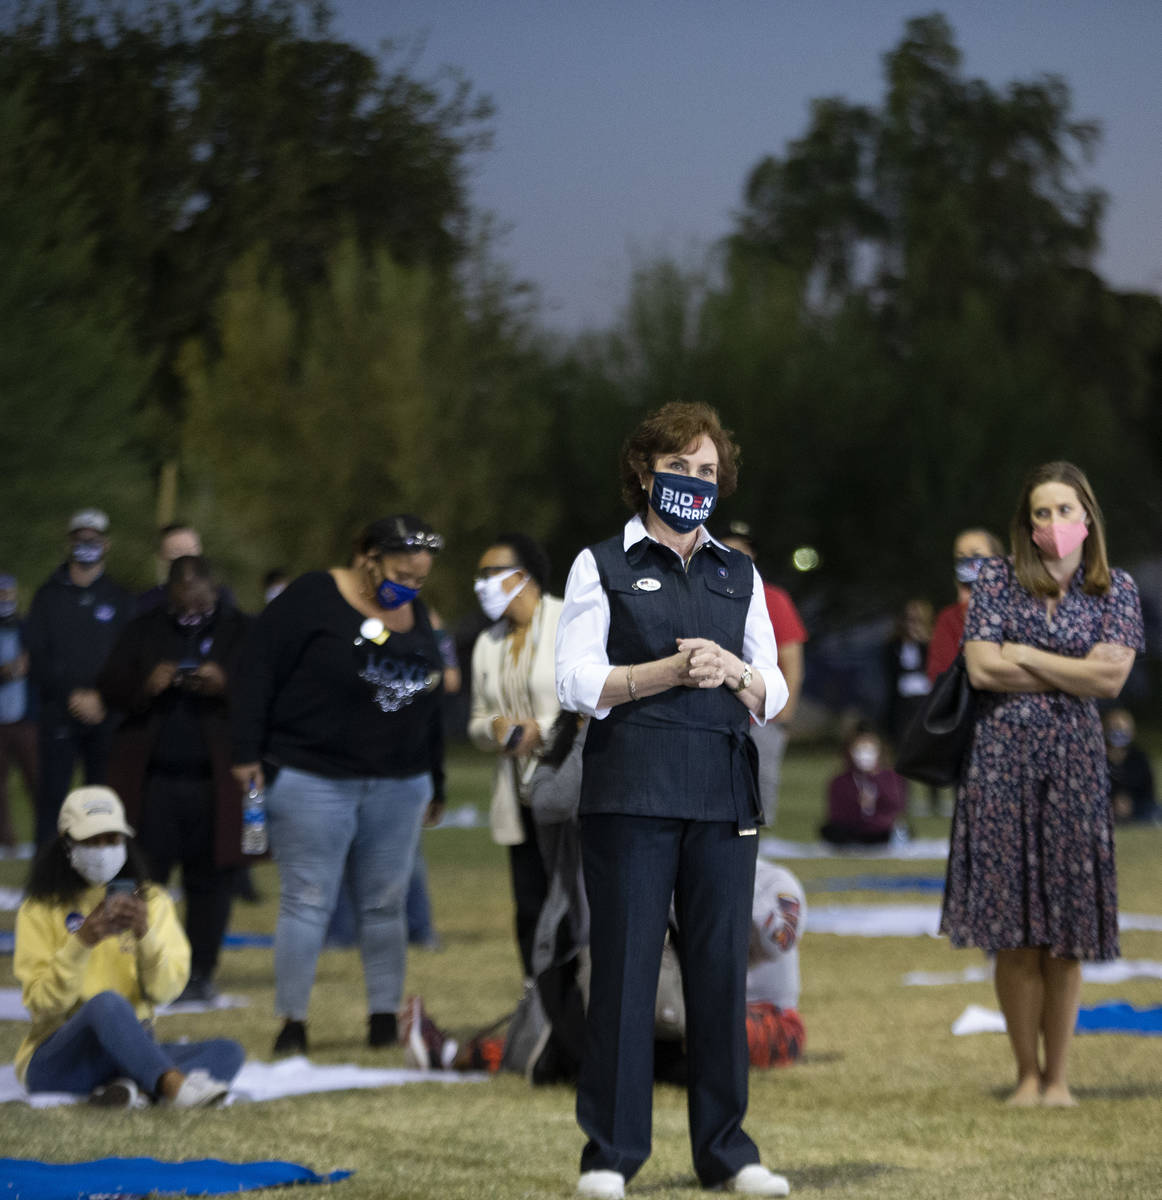 La senadora Jacky Rosen, demócrata por Nevada, observa a la candidata a la vicepresidencia, la ...